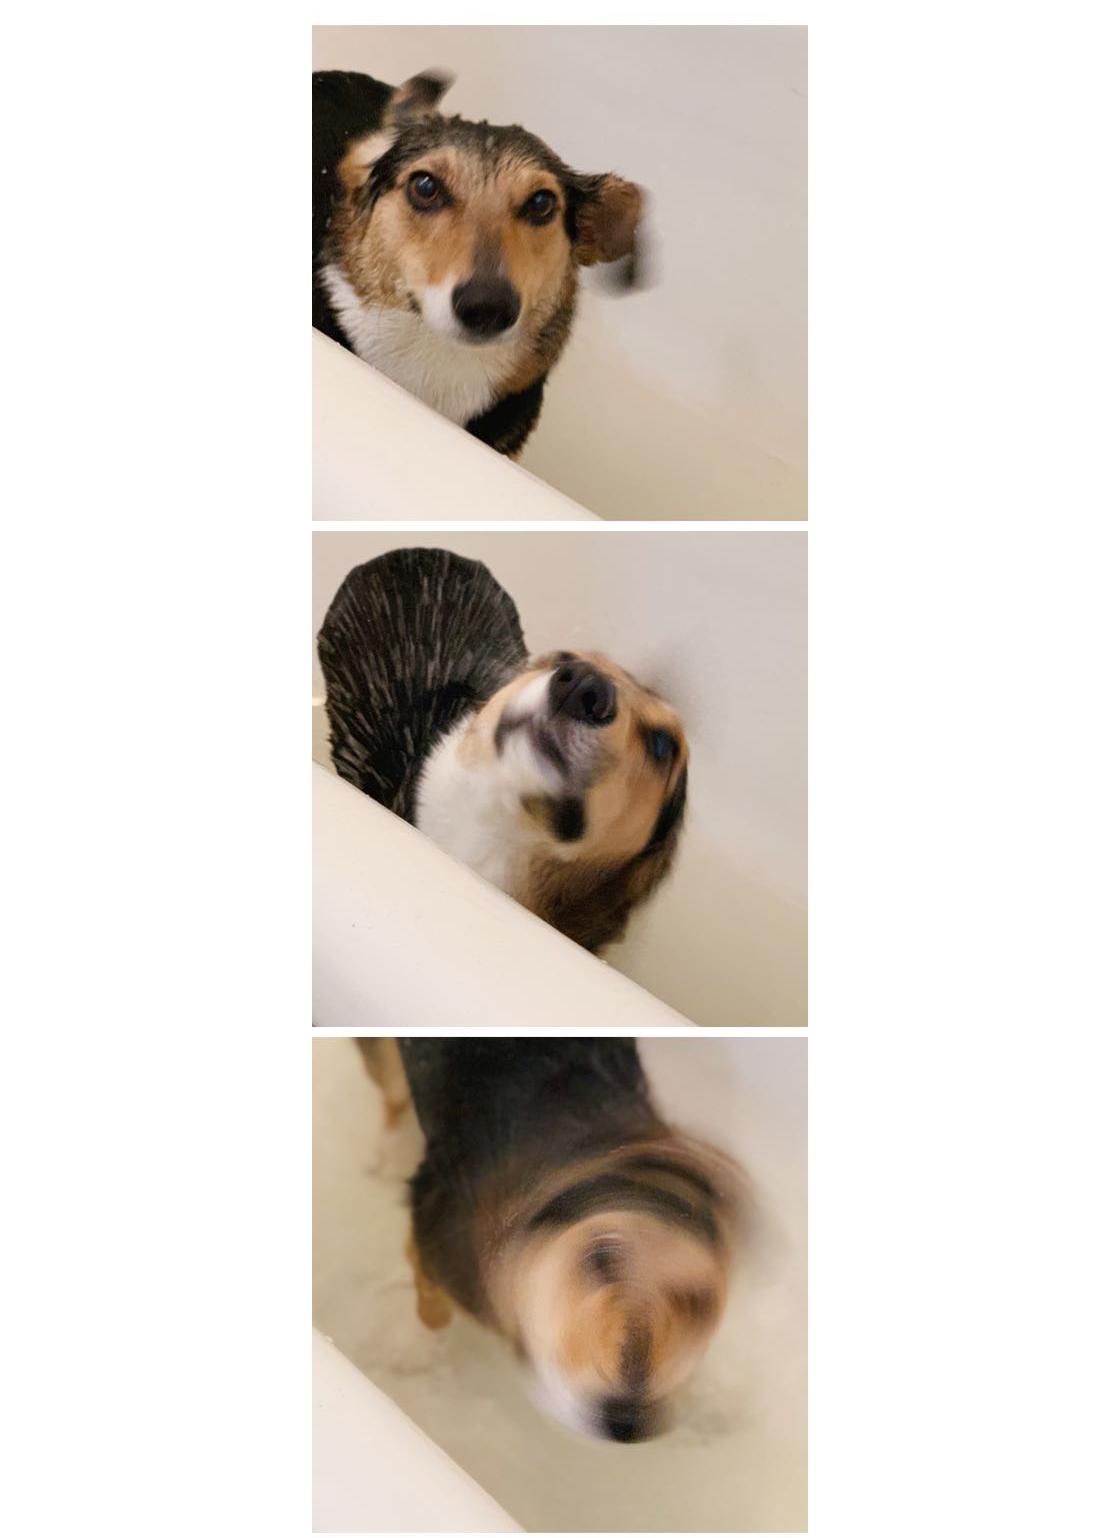 P I P - getting a bath